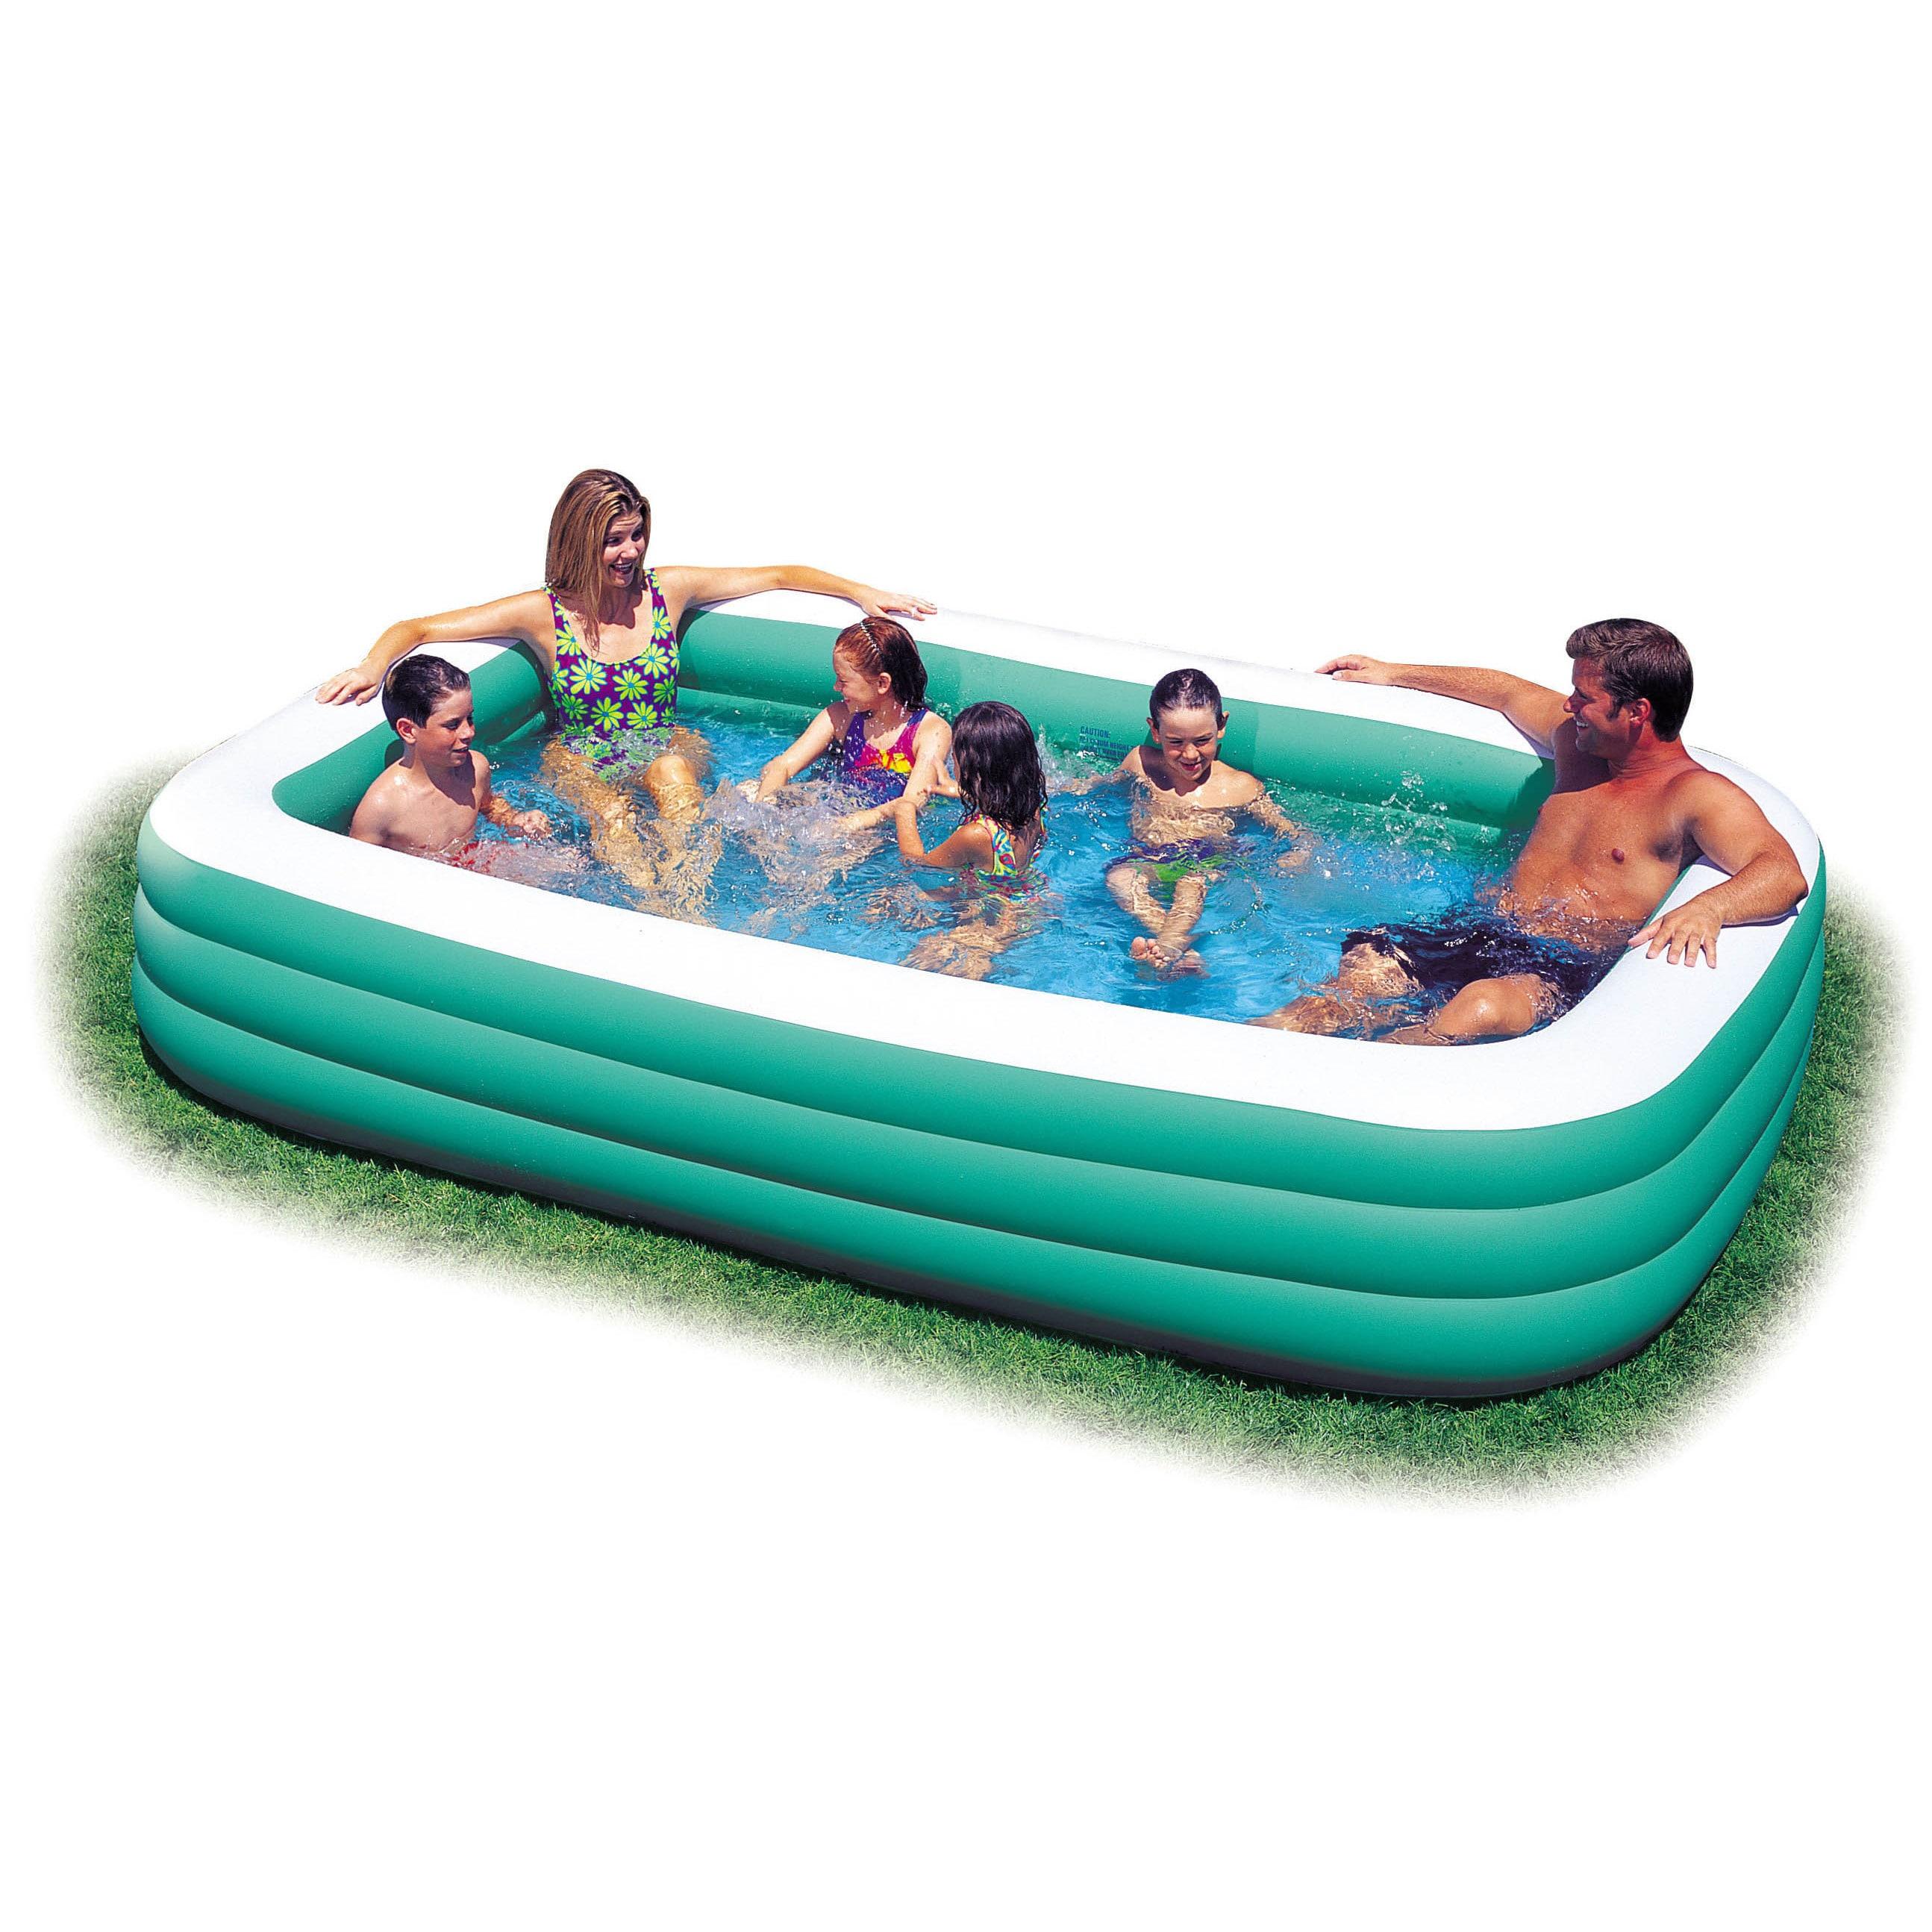 Intex Recreation Swim Center Family Pool (120-inches), Gr...